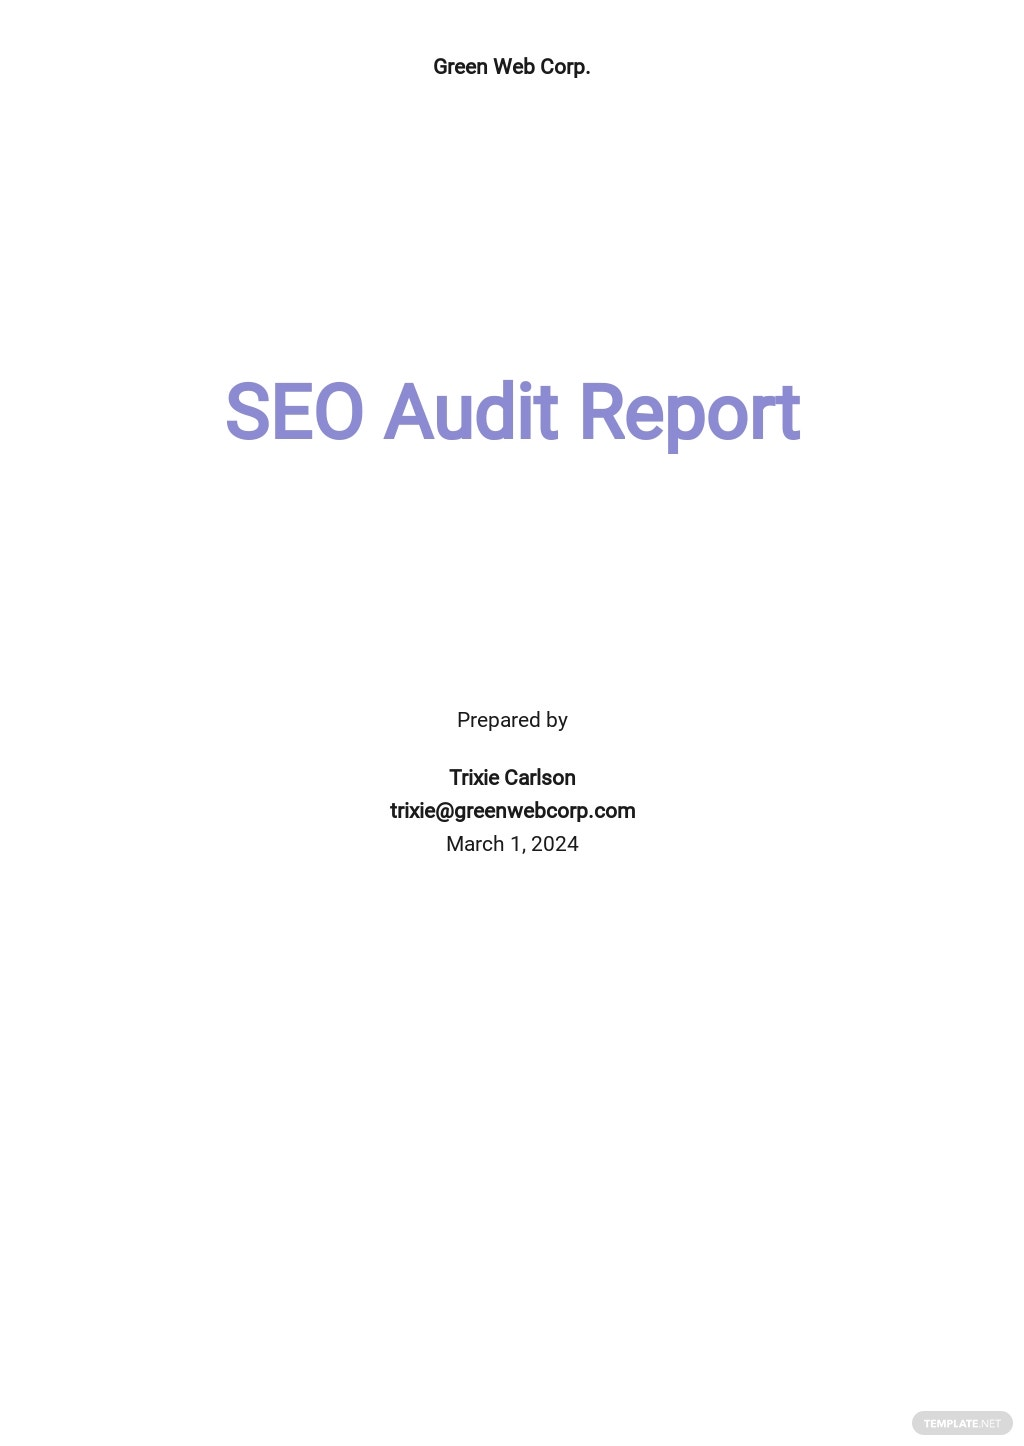 SEO Audit Report Template.jpe